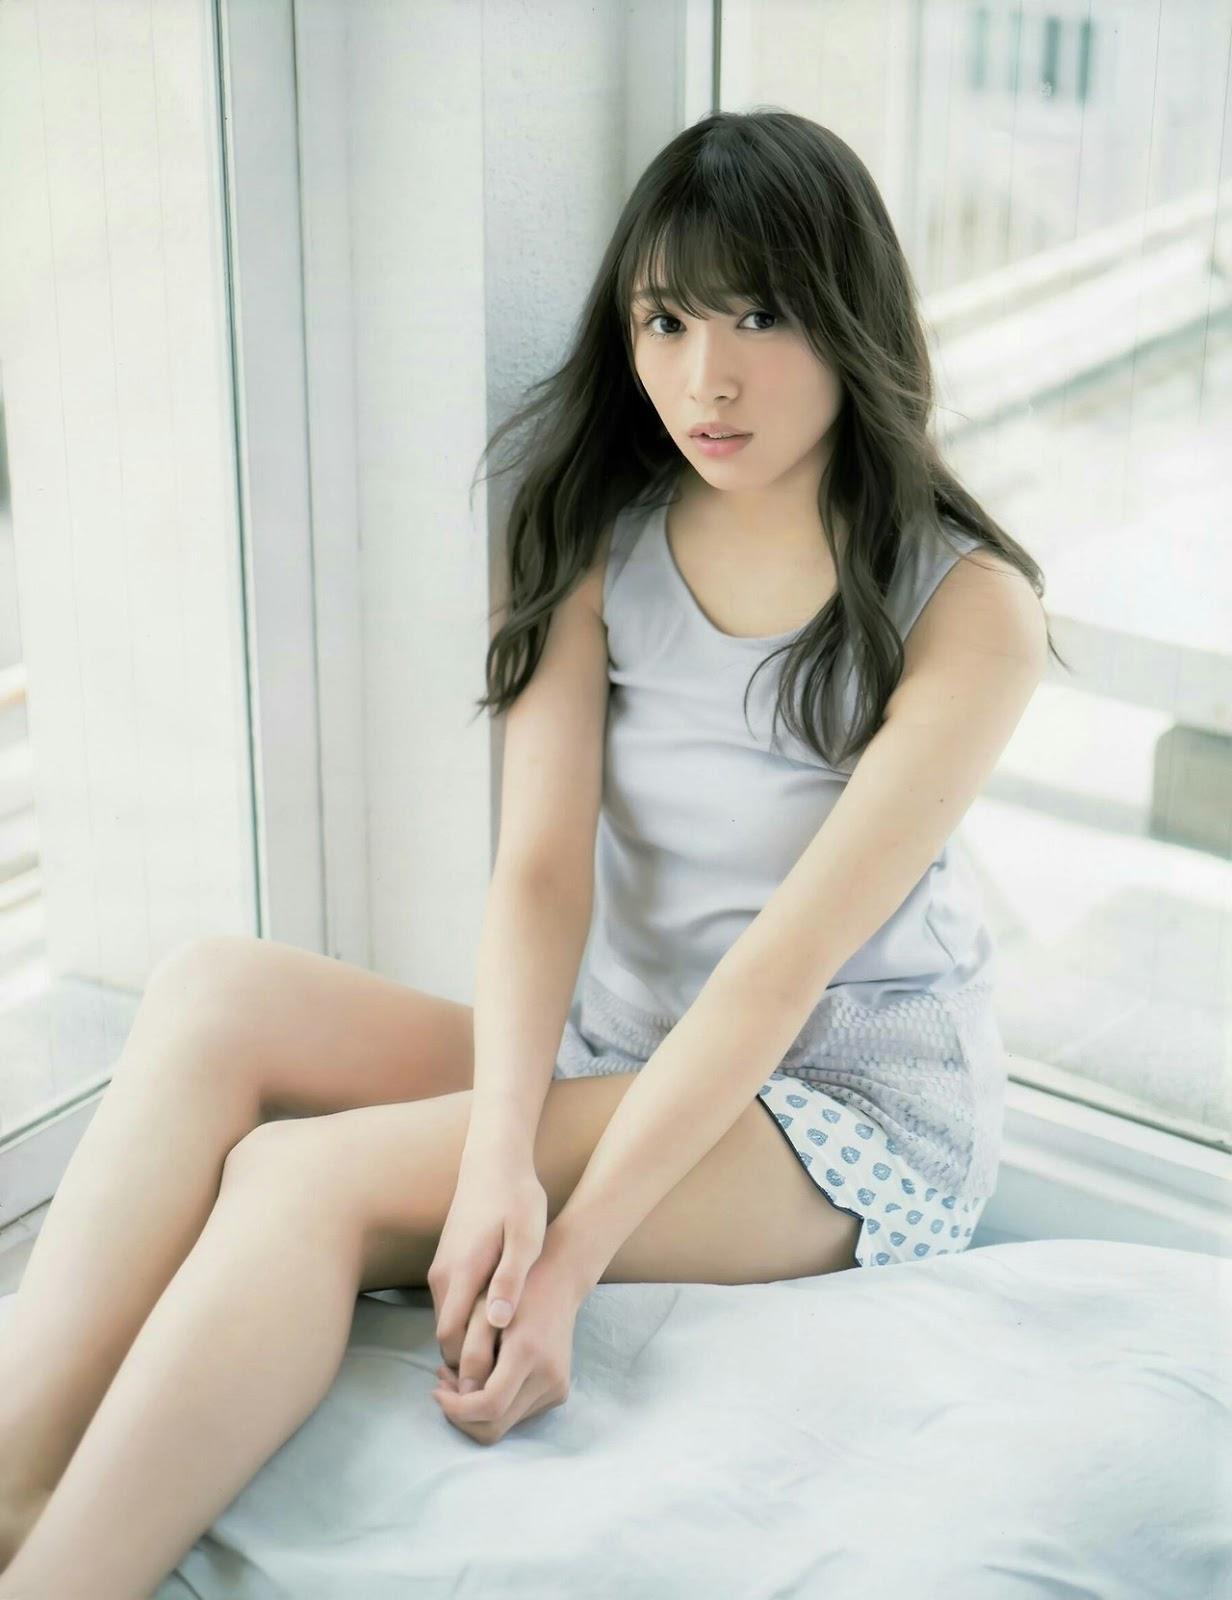 Watanabe Rika 渡辺梨加, Sugai Yuuka 菅井友香, Ex-Taishu 2017.08 (EX大衆 2017年08月号)